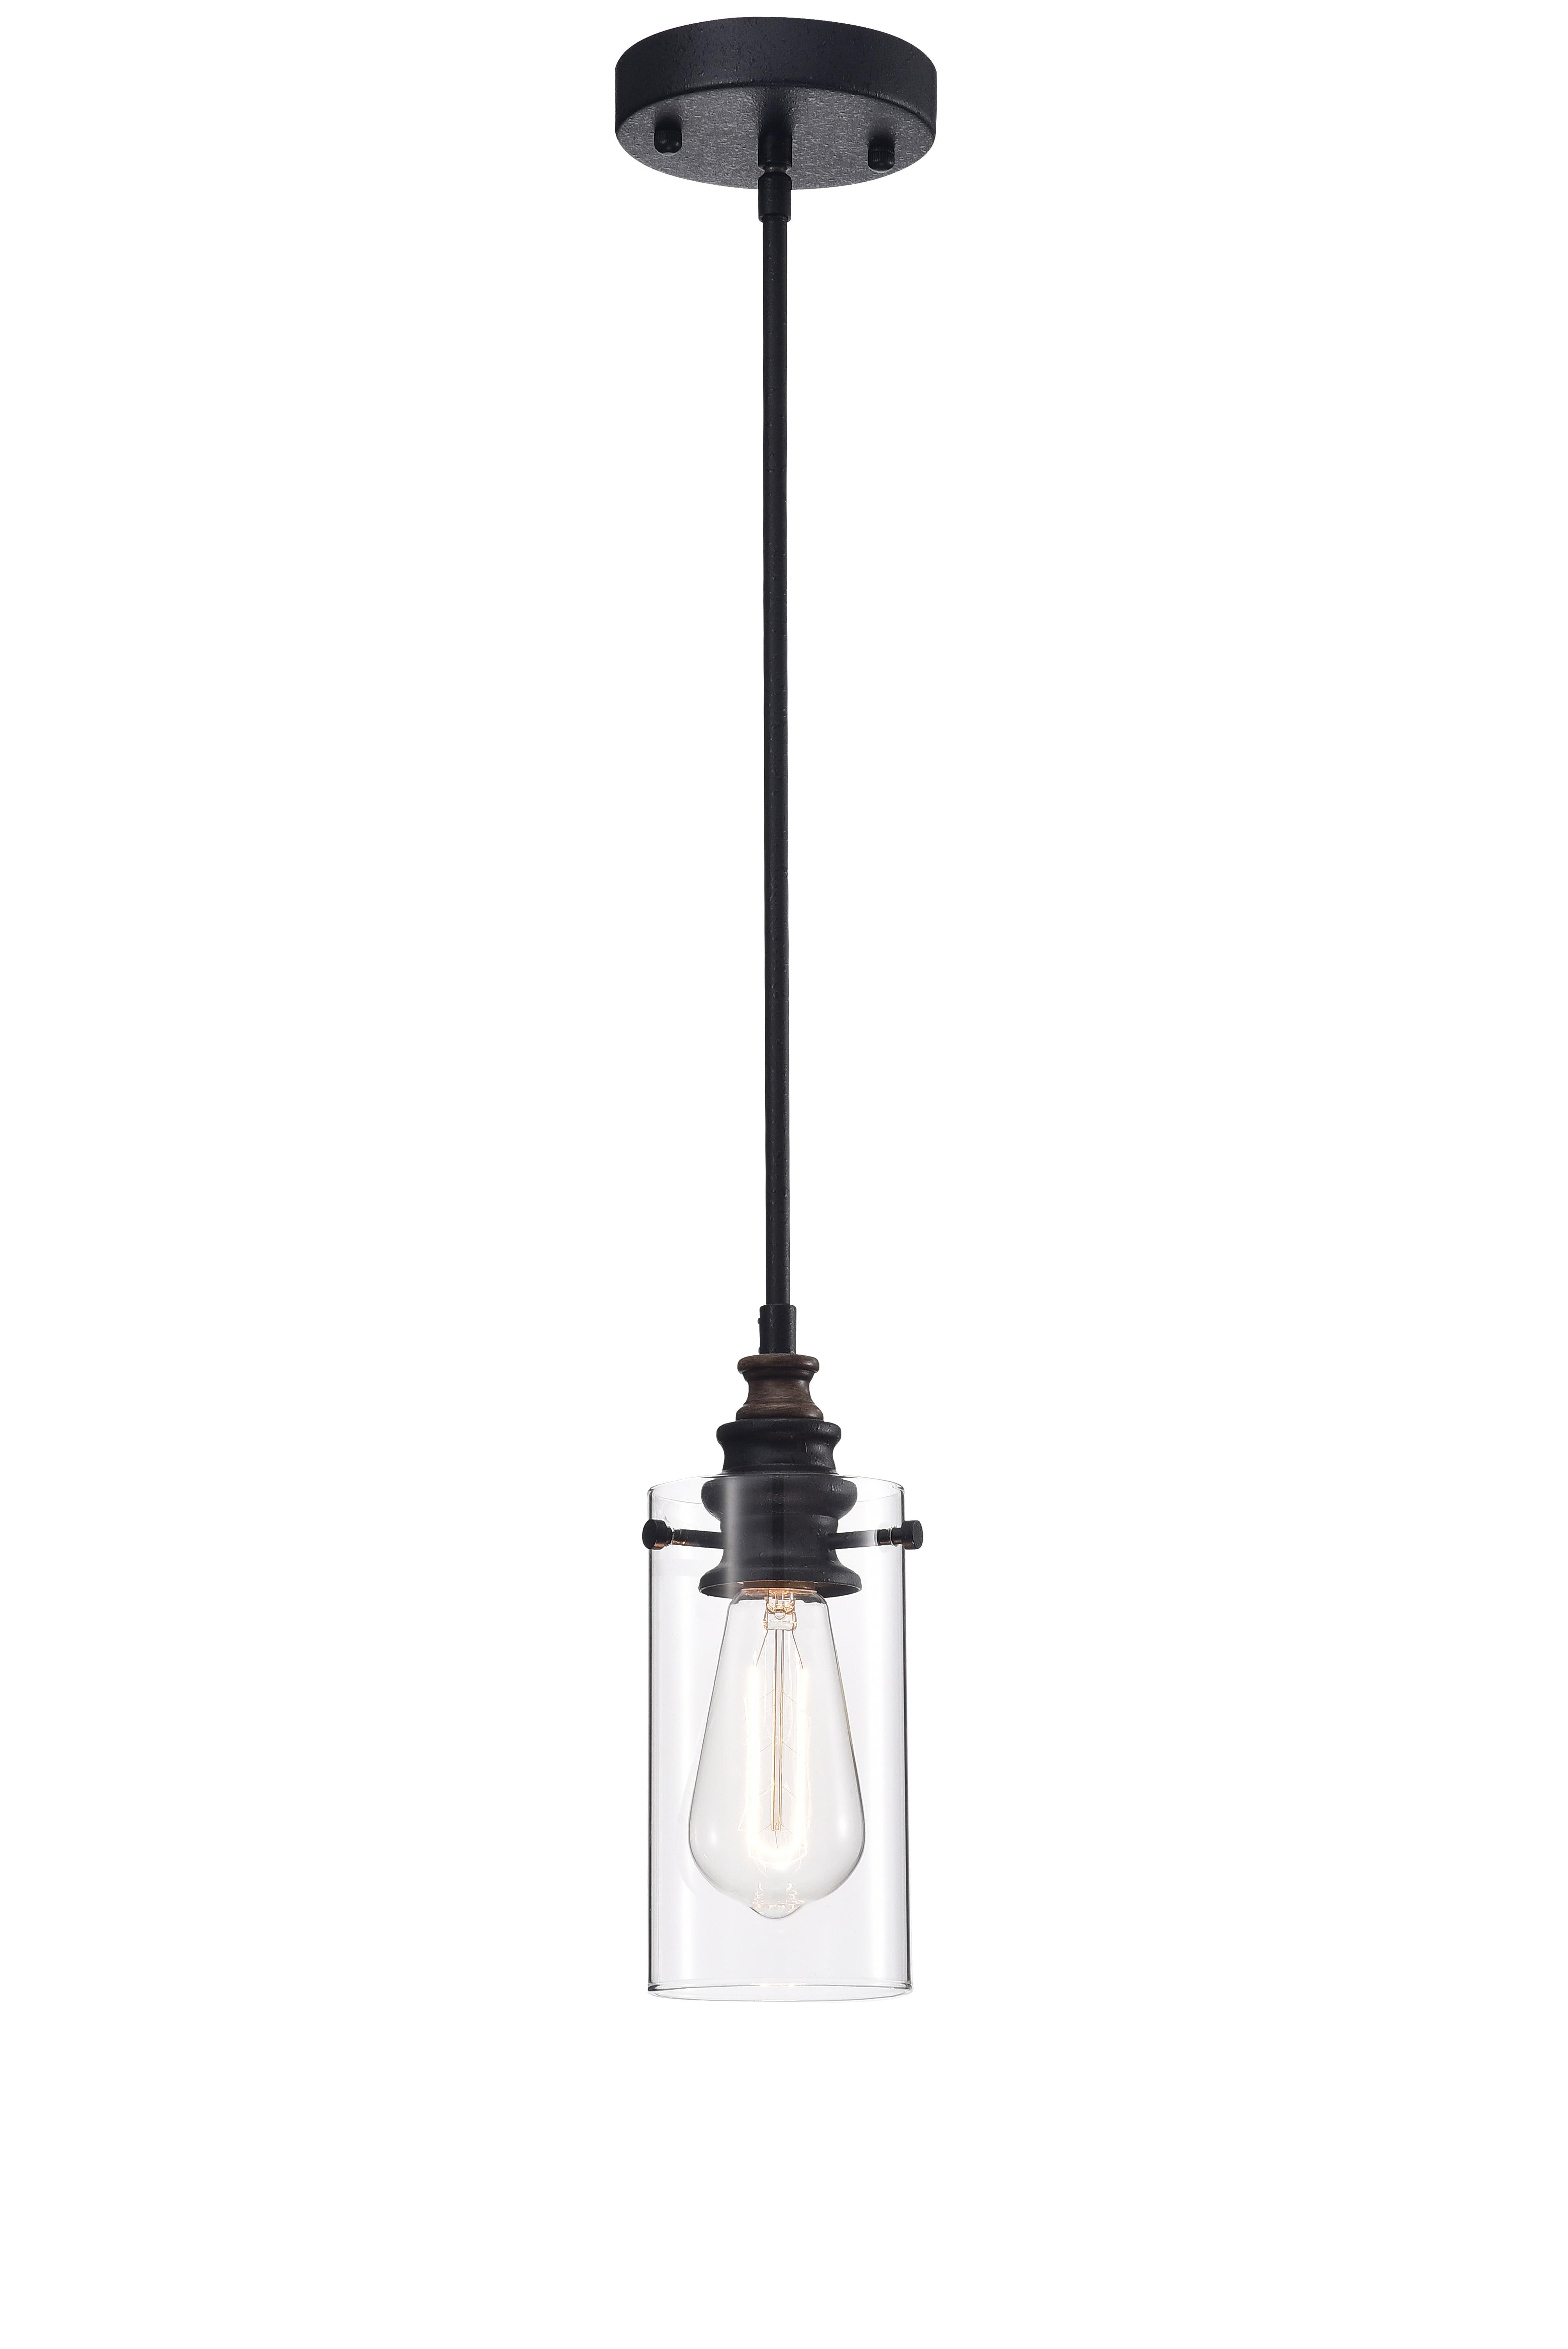 Edison Light Bulb Pendant Pendant Light Fixture Wide Cylinder Shade Pendant Light Edison Bulb Kitchen Light